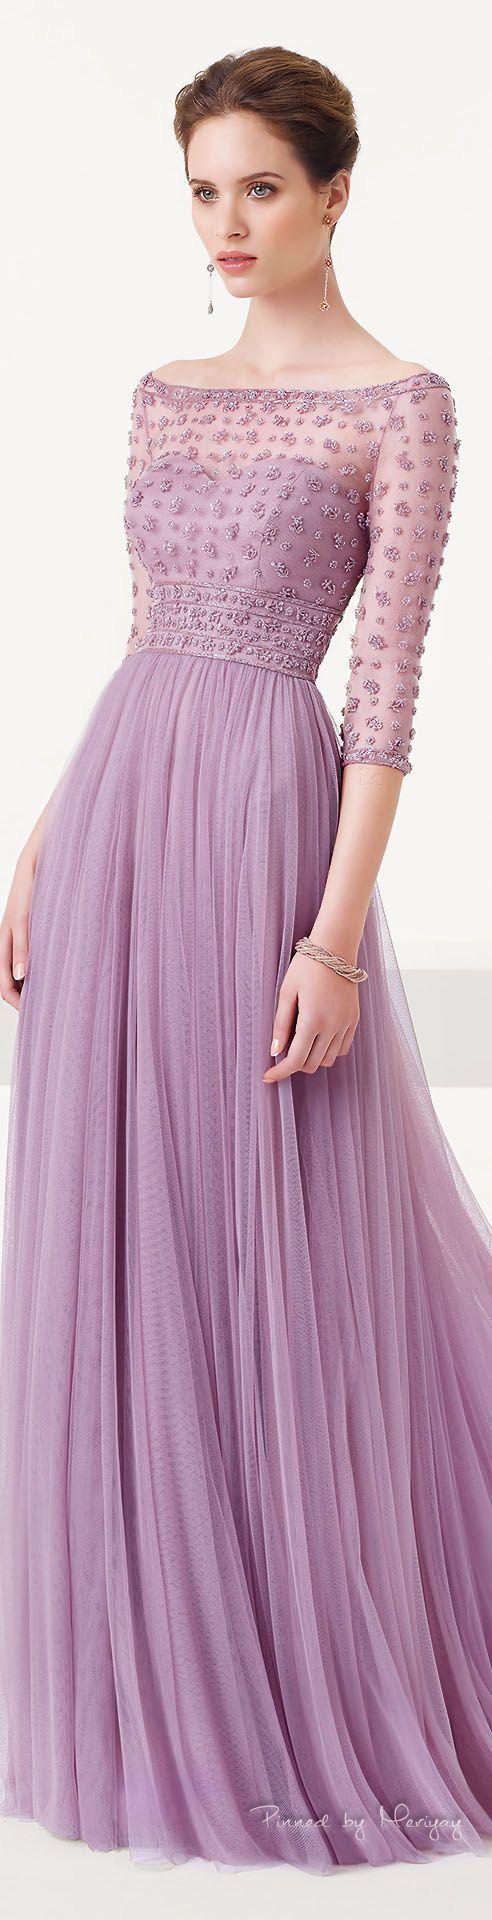 Pretty and beautiful dress   Pretty Dresses   Pinterest   Kleider ...